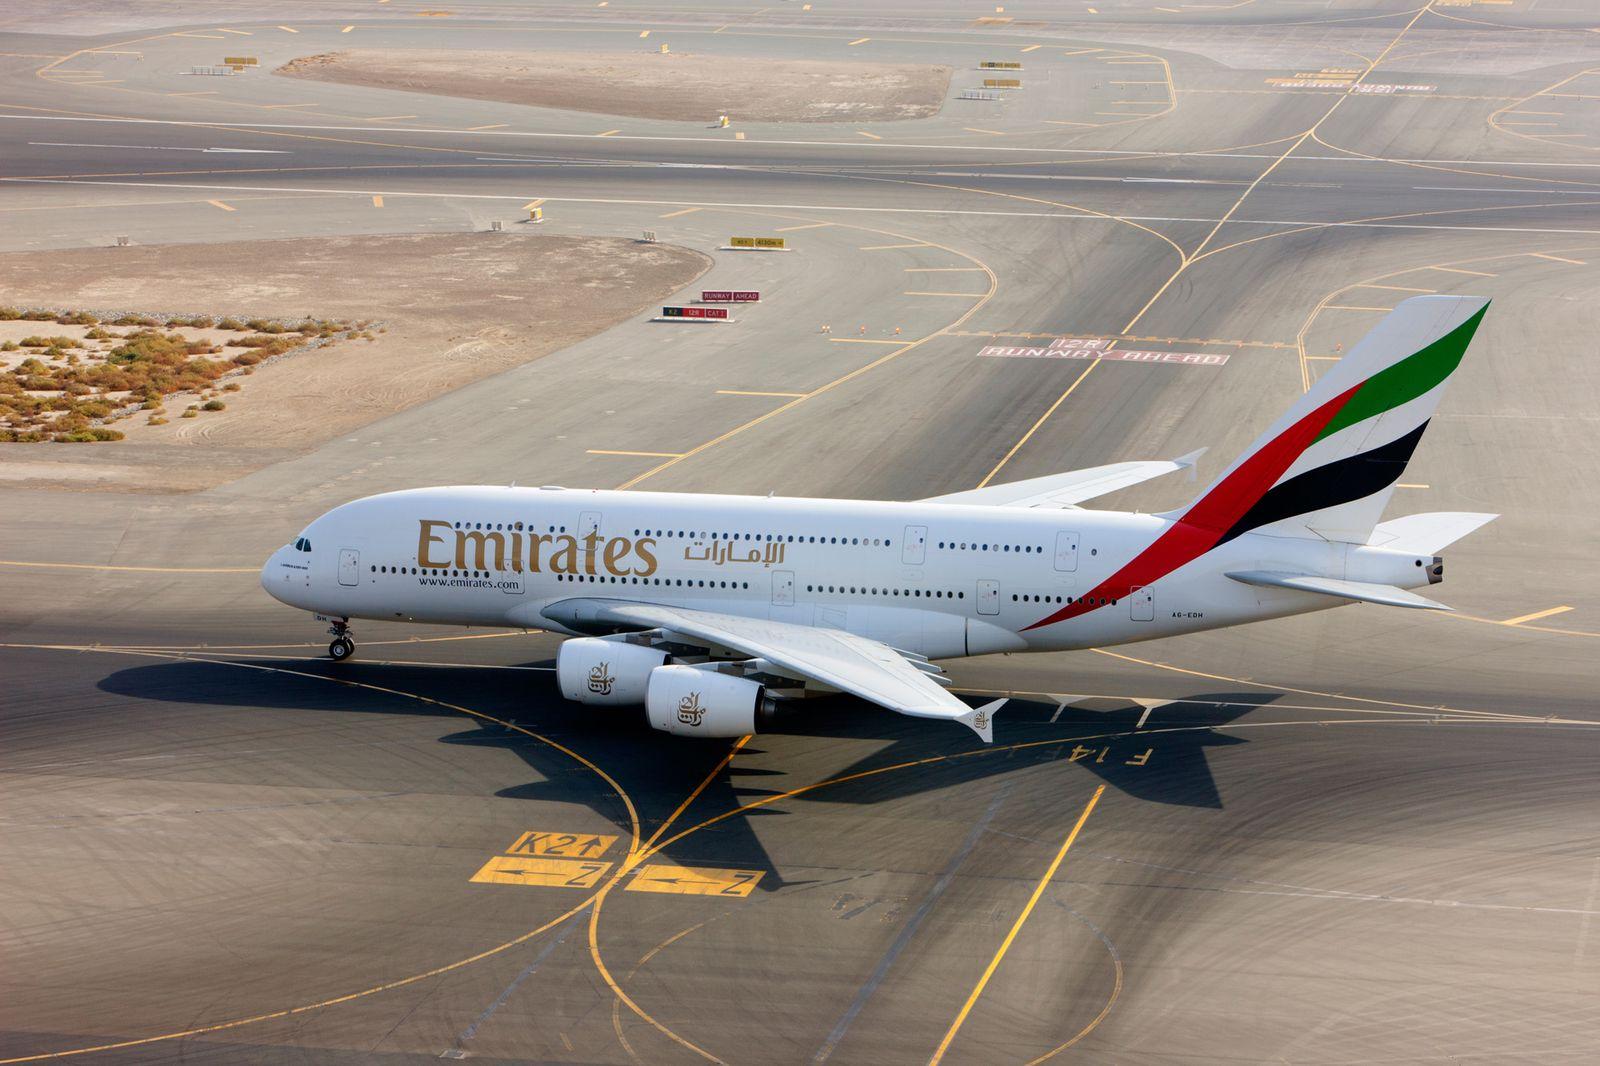 Emirates / A 380